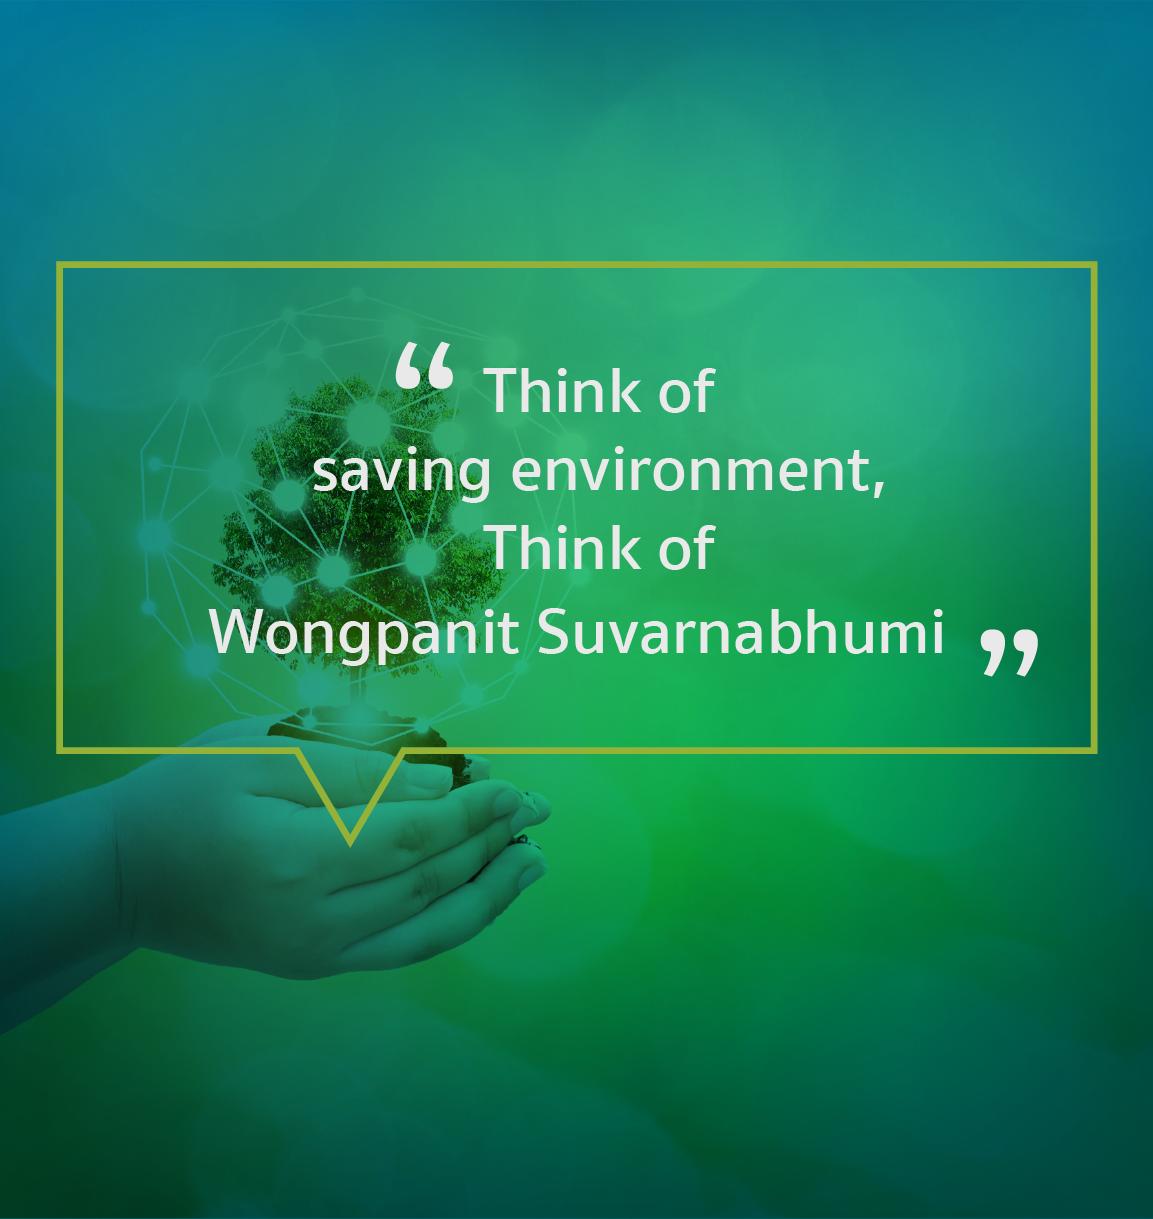 Think of saving environment, Think of Wongpanit Suvarnabhumi